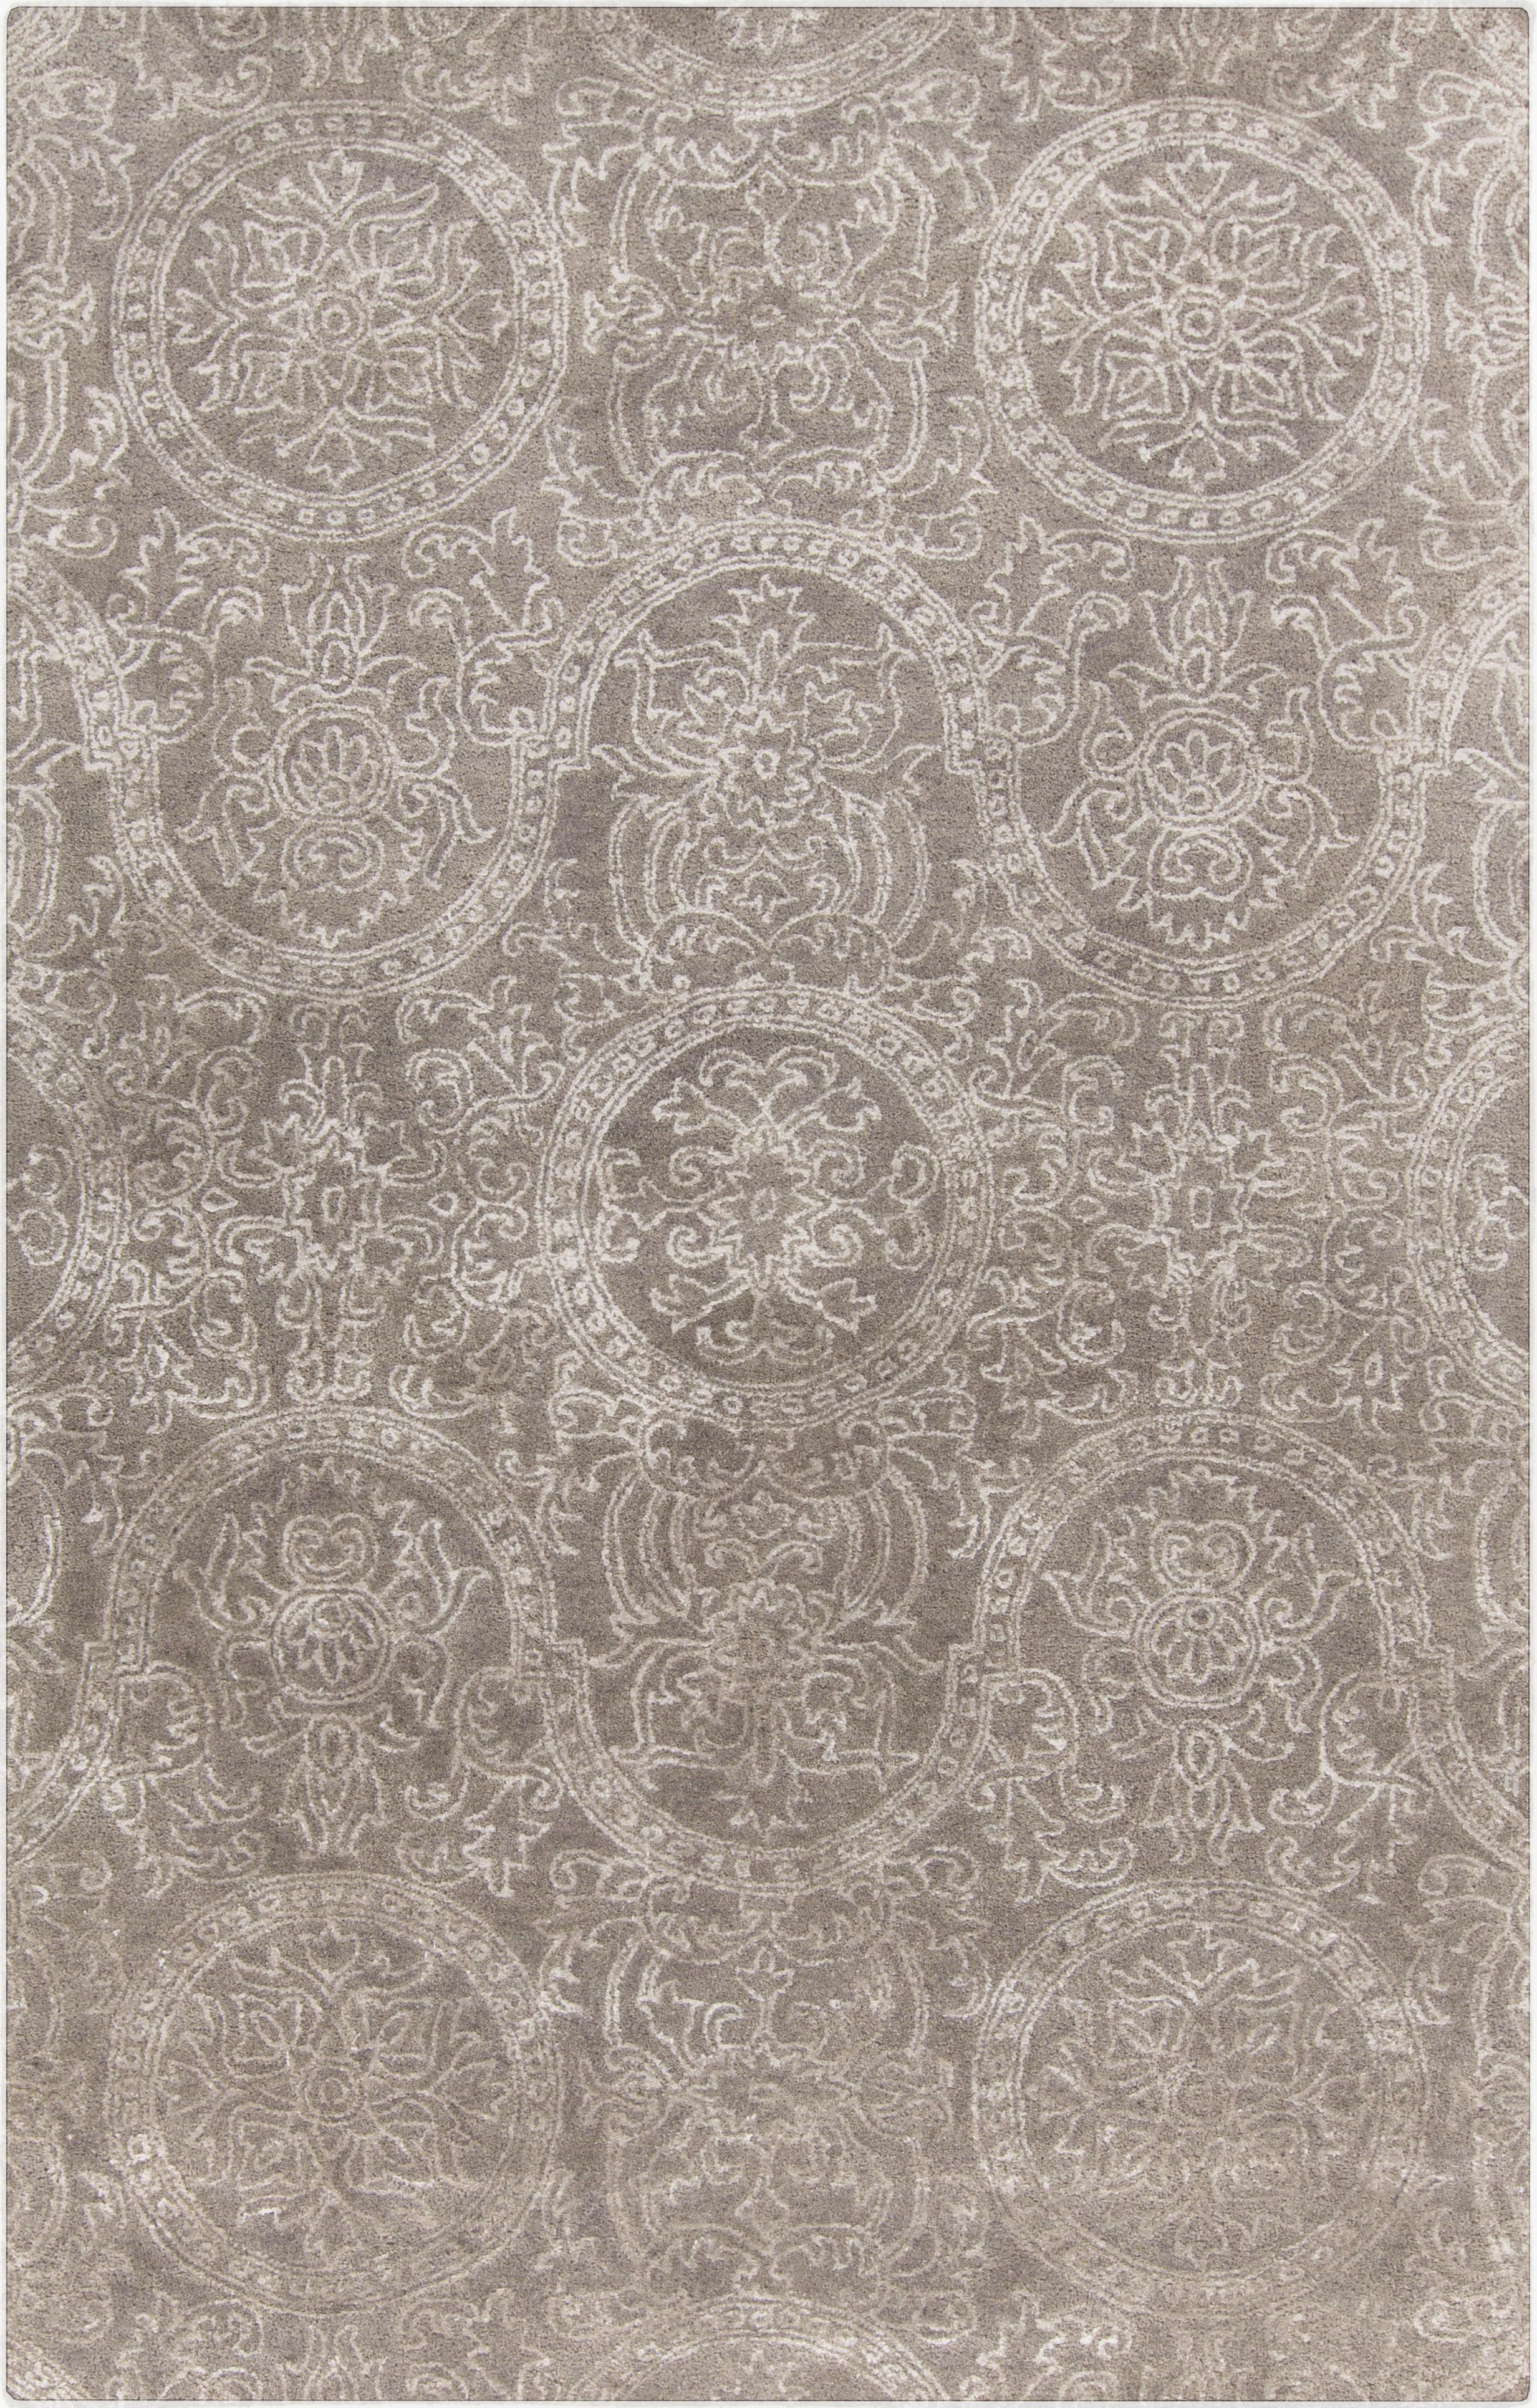 Henna 5' x 8' by 9596 at Becker Furniture